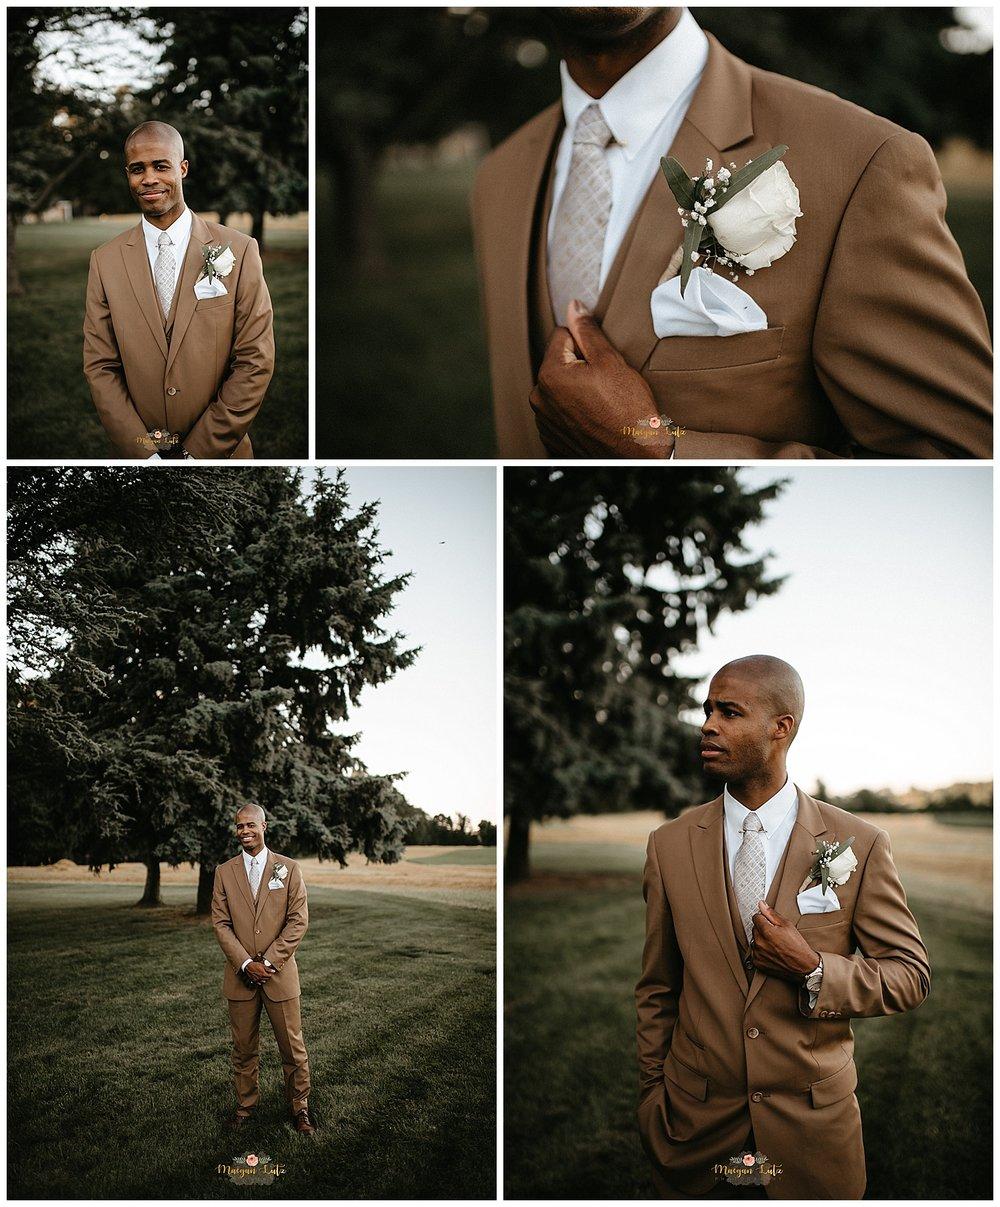 NEPA-Wedding-Photographer-in-Central-PA_0144.jpg